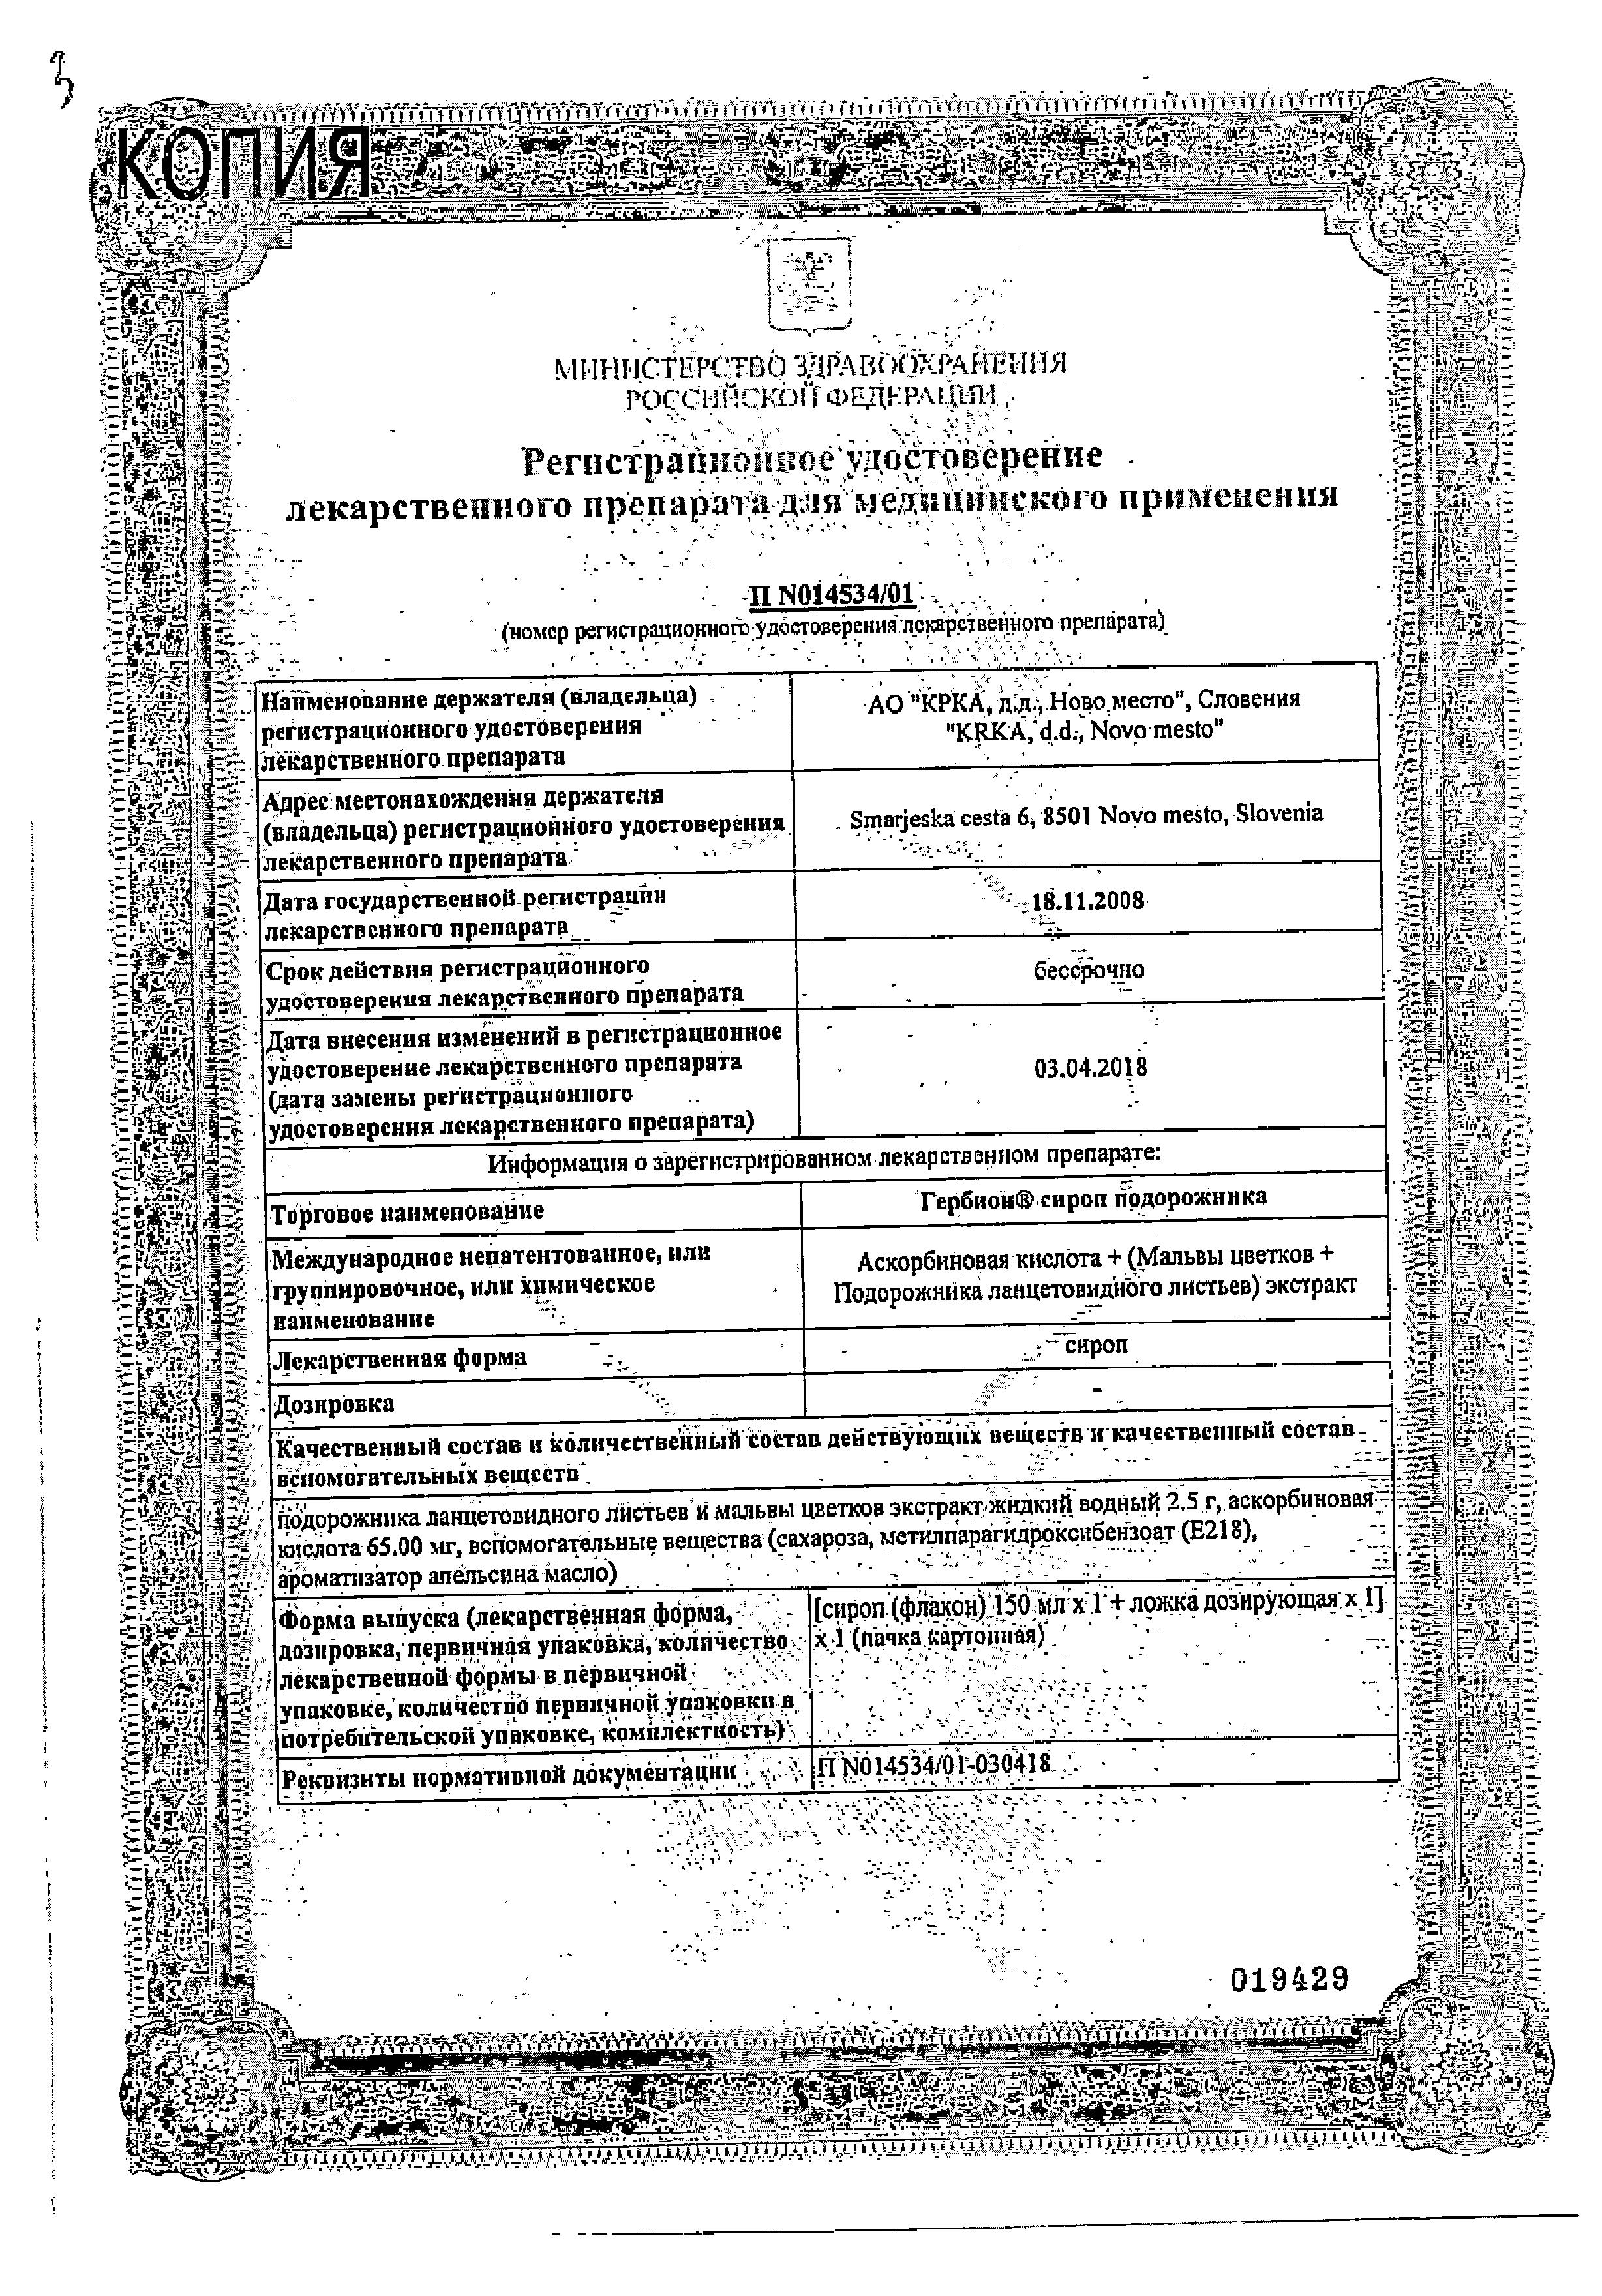 Гербион сироп подорожника сертификат